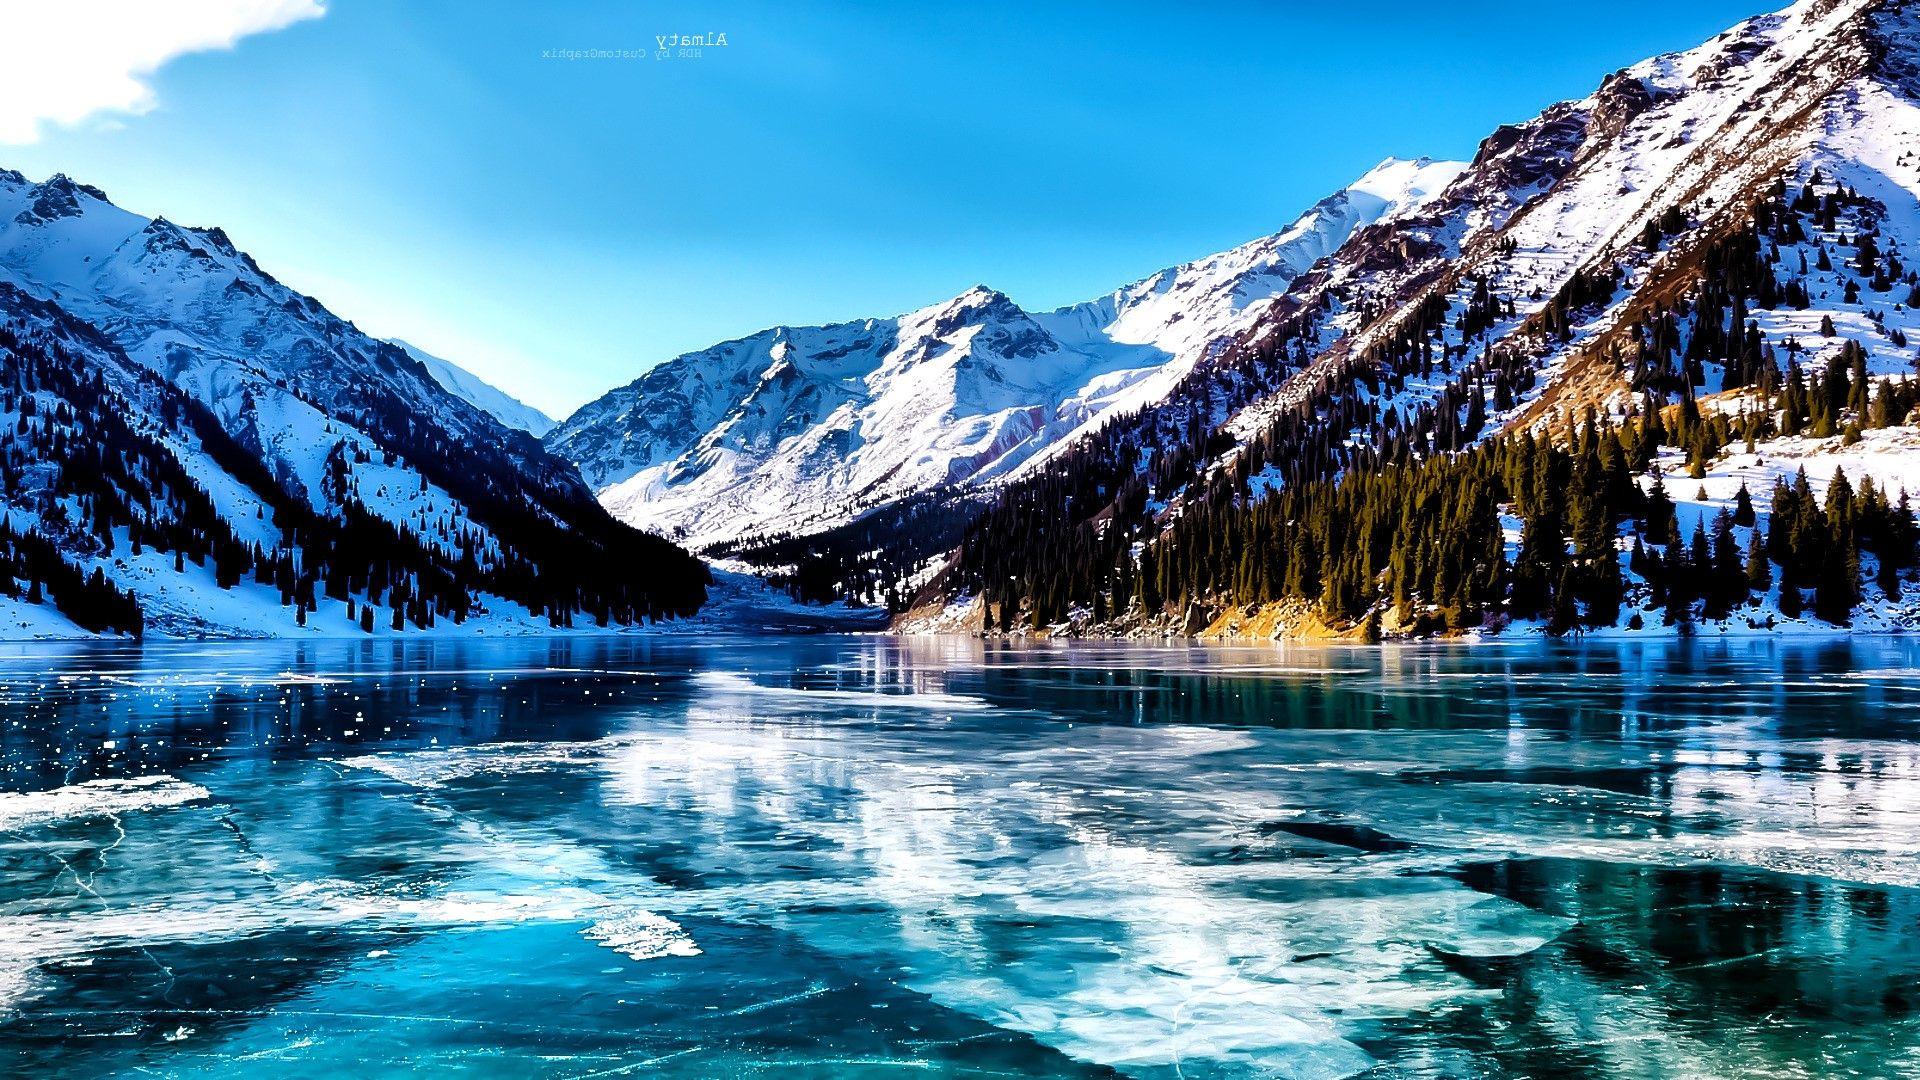 Pin On Jenny Krueger Hd wallpaper lake ice mountains valley